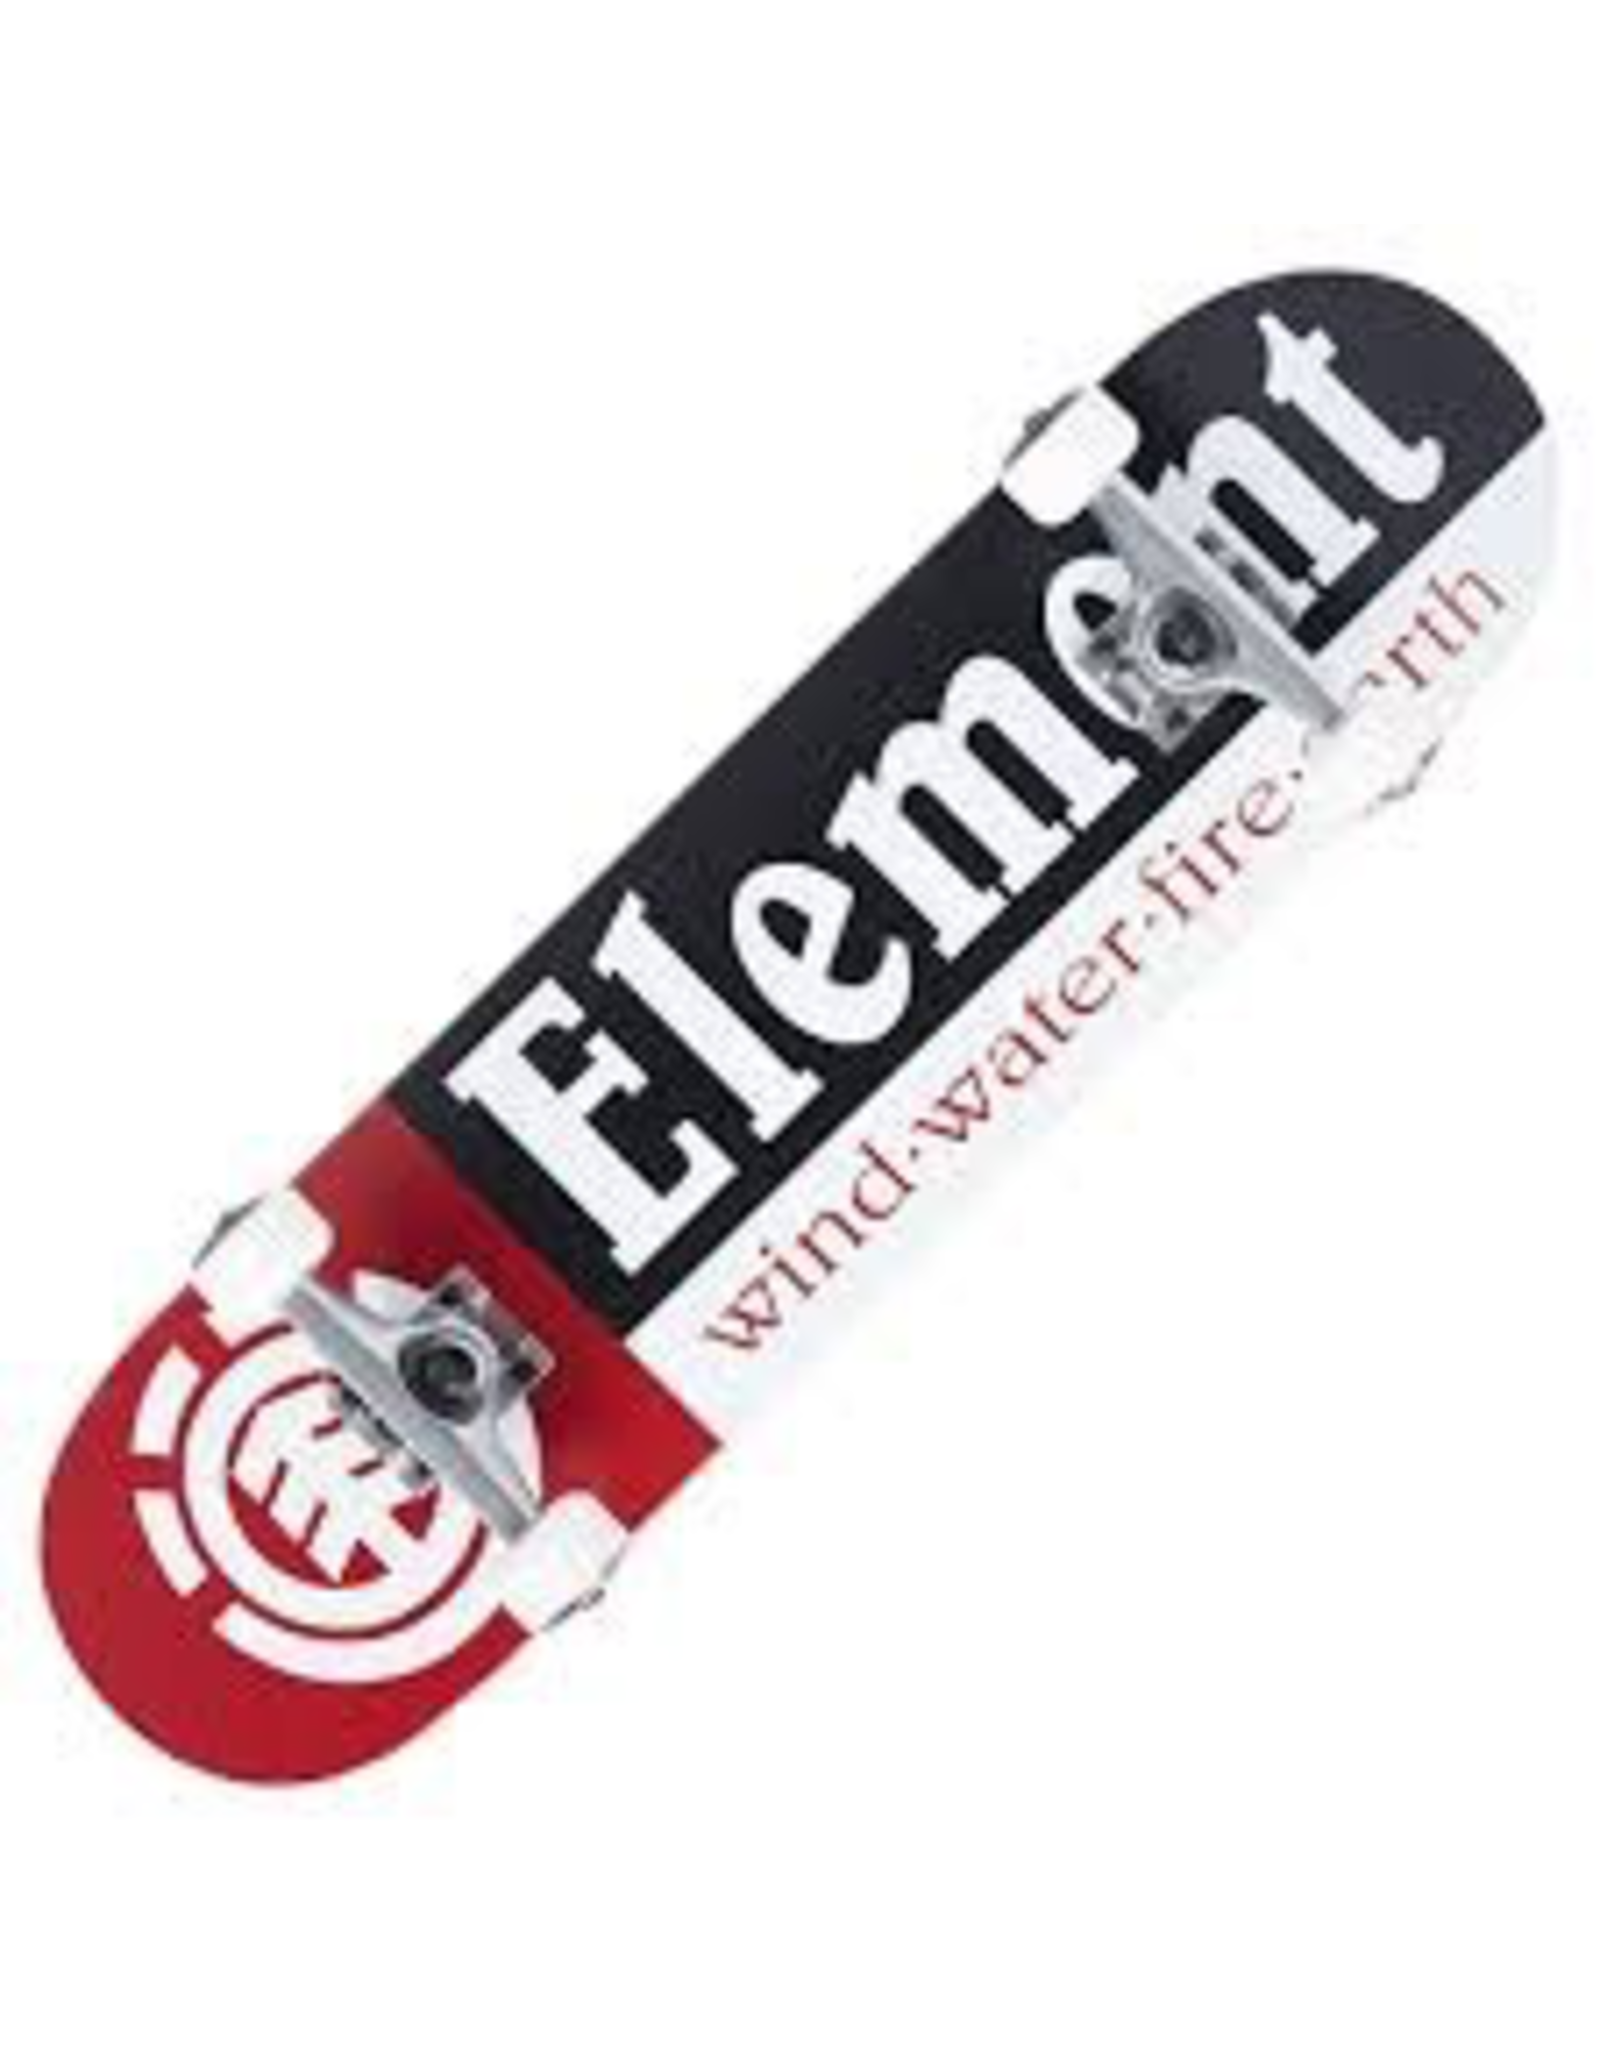 ELEMENT ELEMENT SECTION SKATEBOARD COMPLETE - 7.75